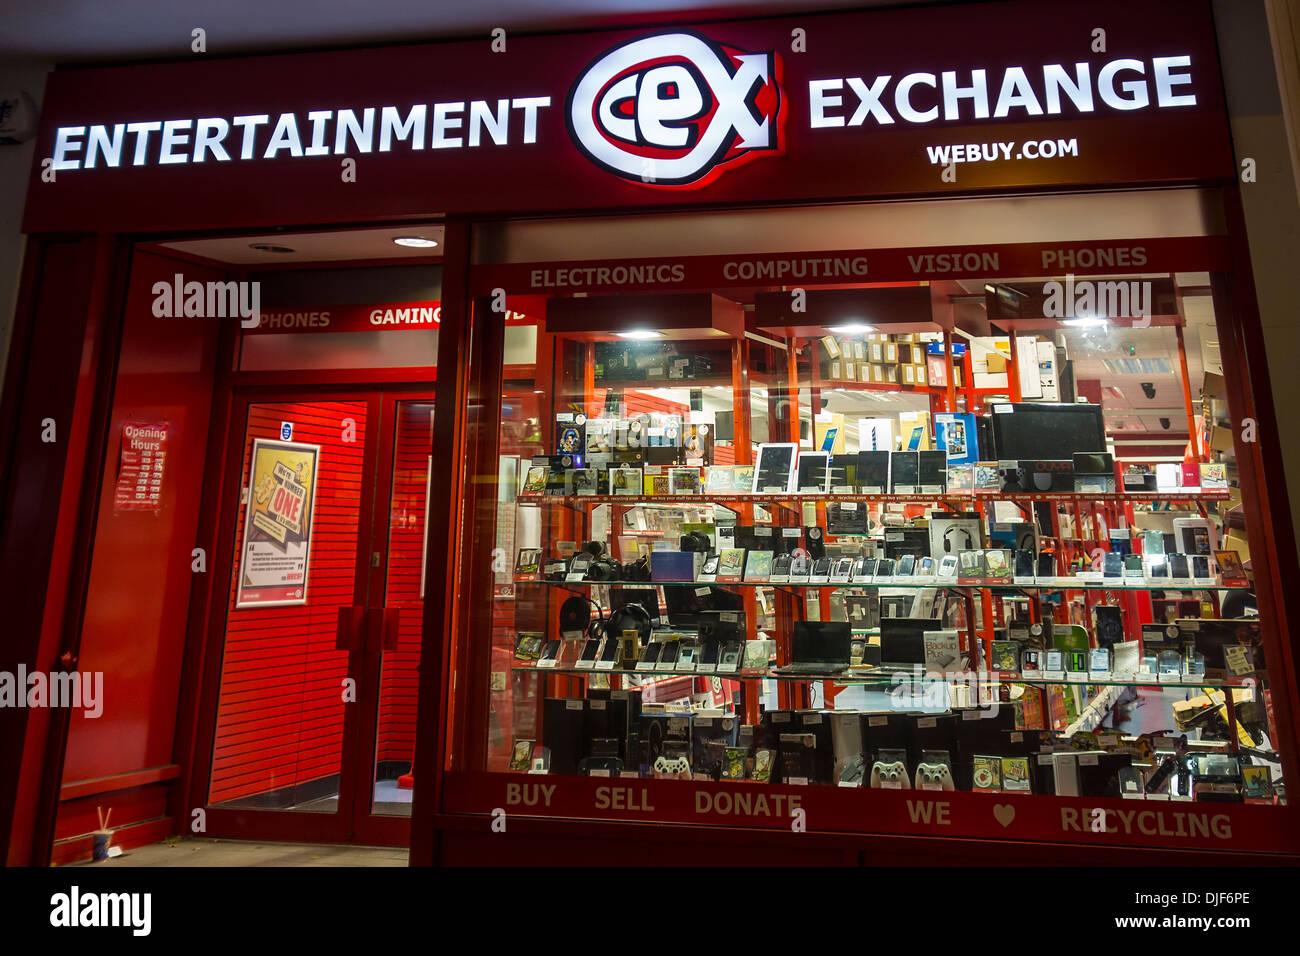 Entertainment Exchange CEX Webuy.com Stock Photo, Royalty